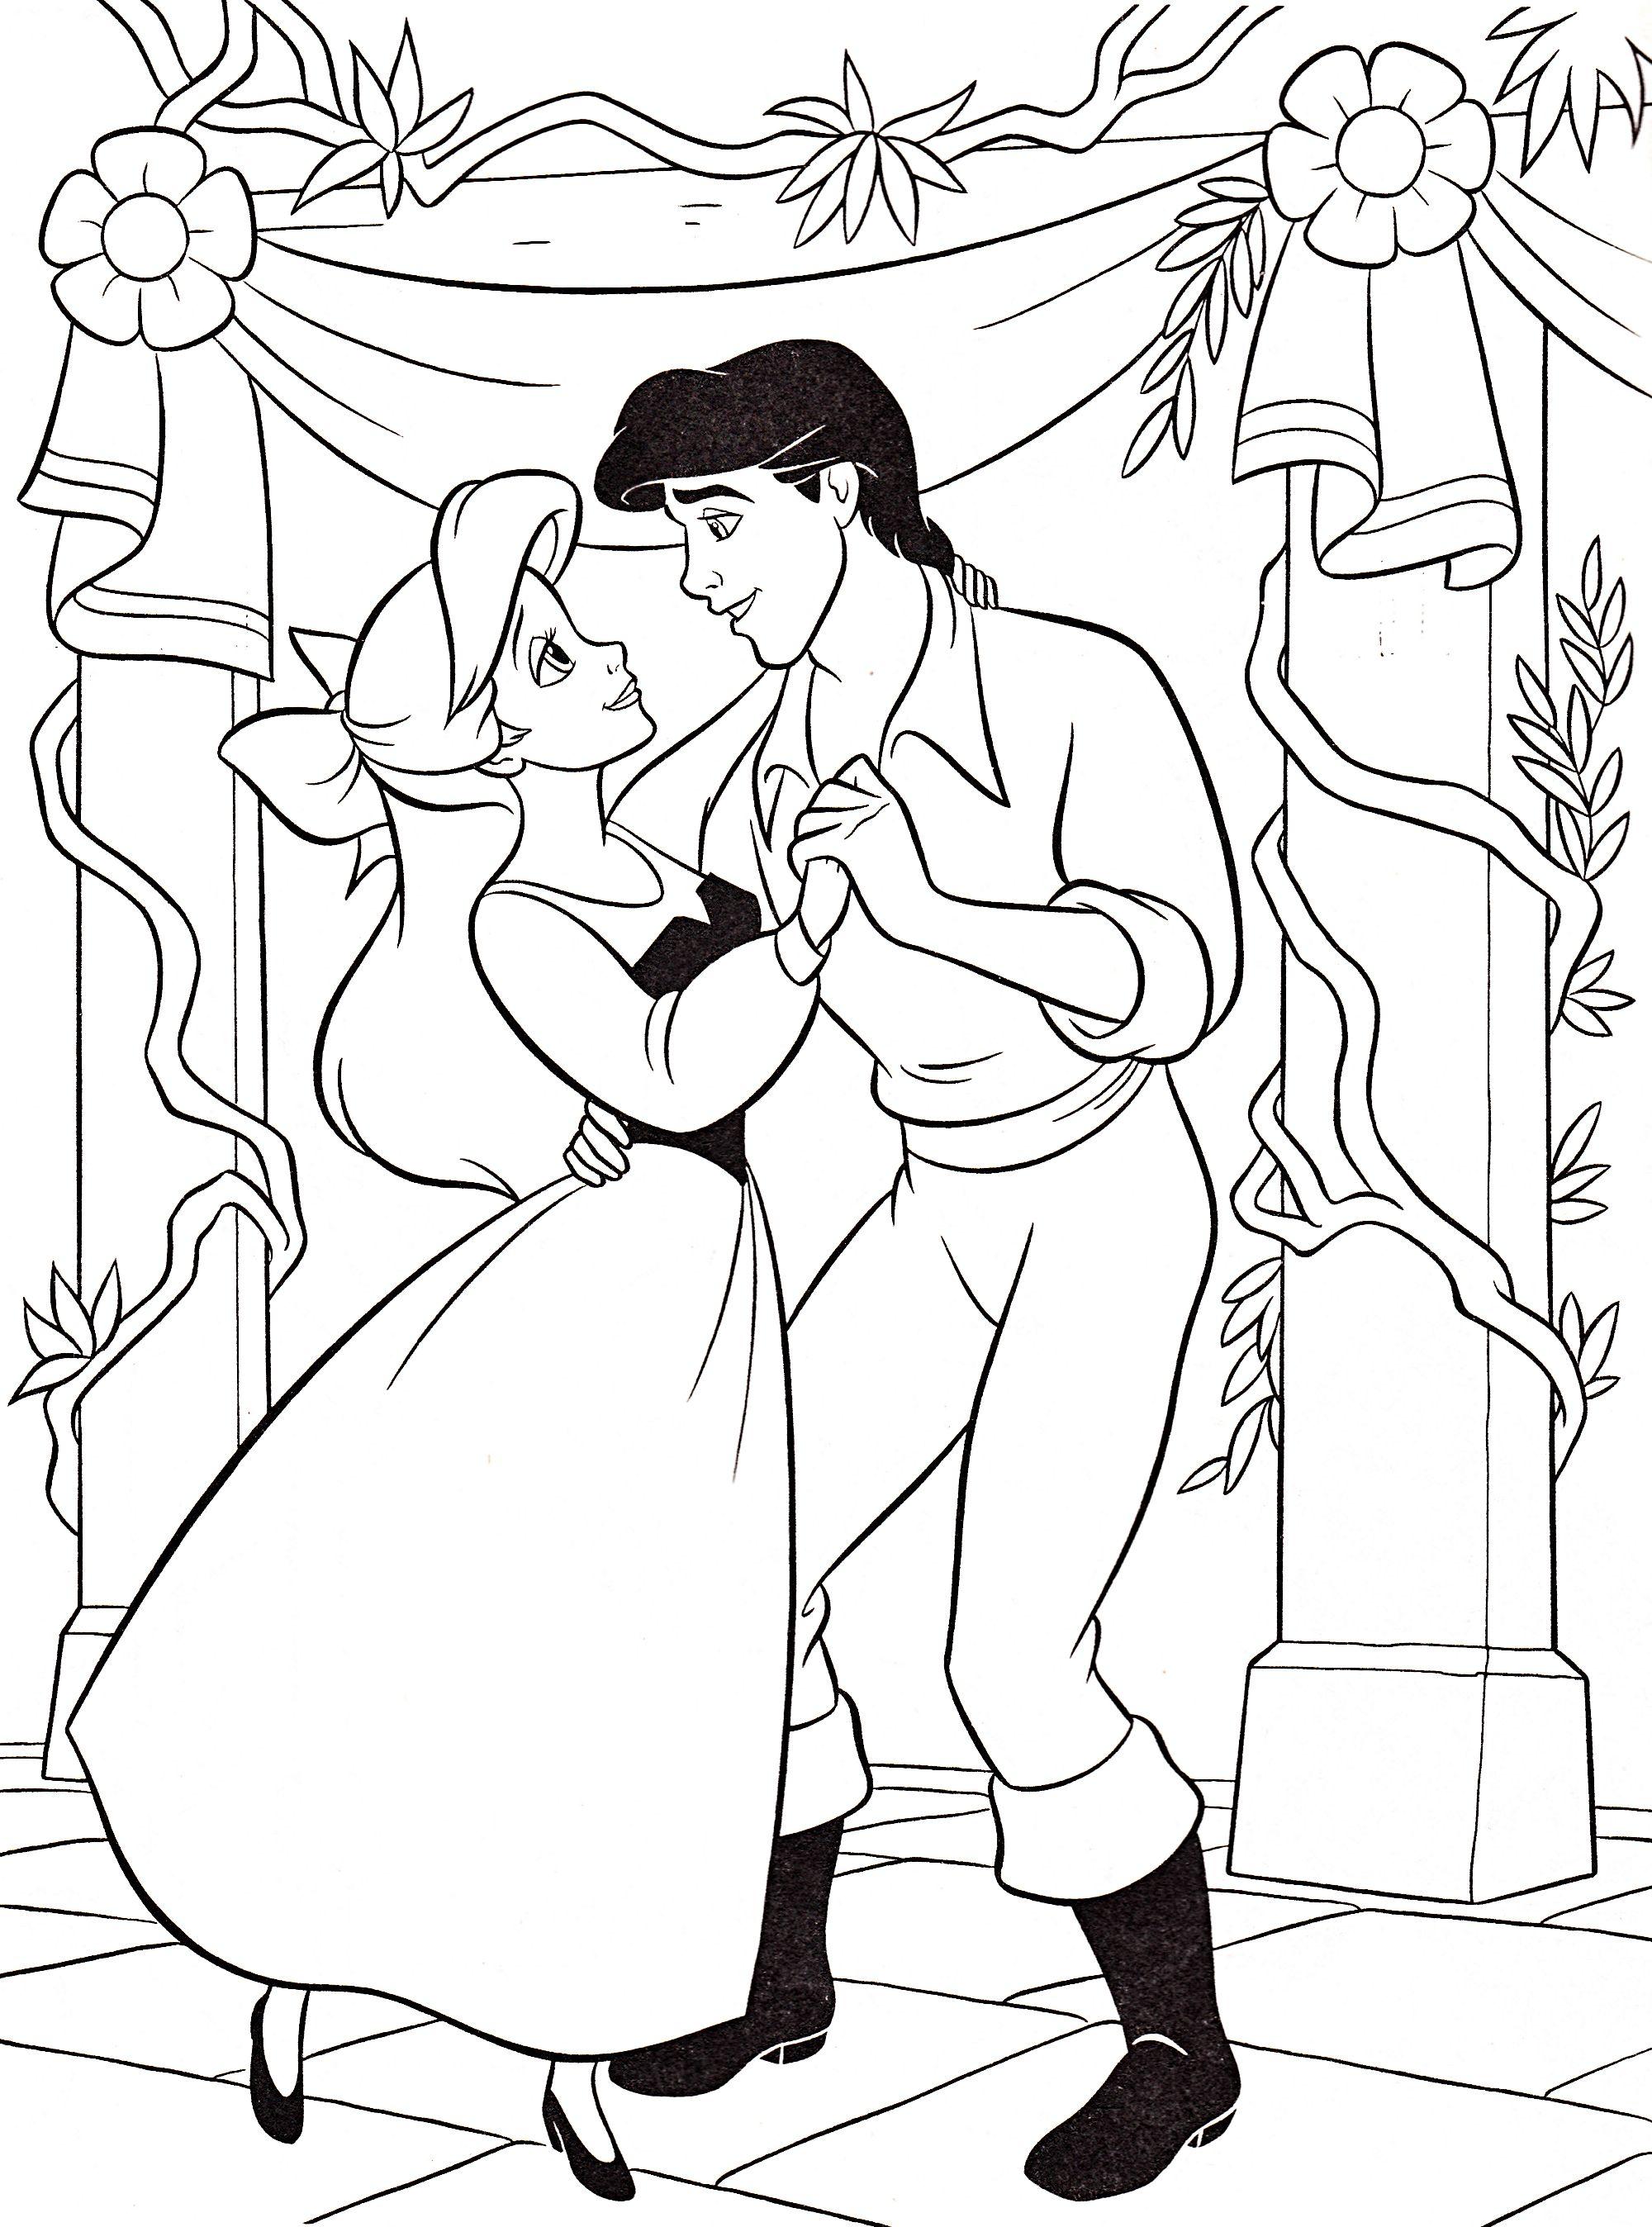 Walt Disney Coloring Pages Princess Ariel Prince Eric Ariel